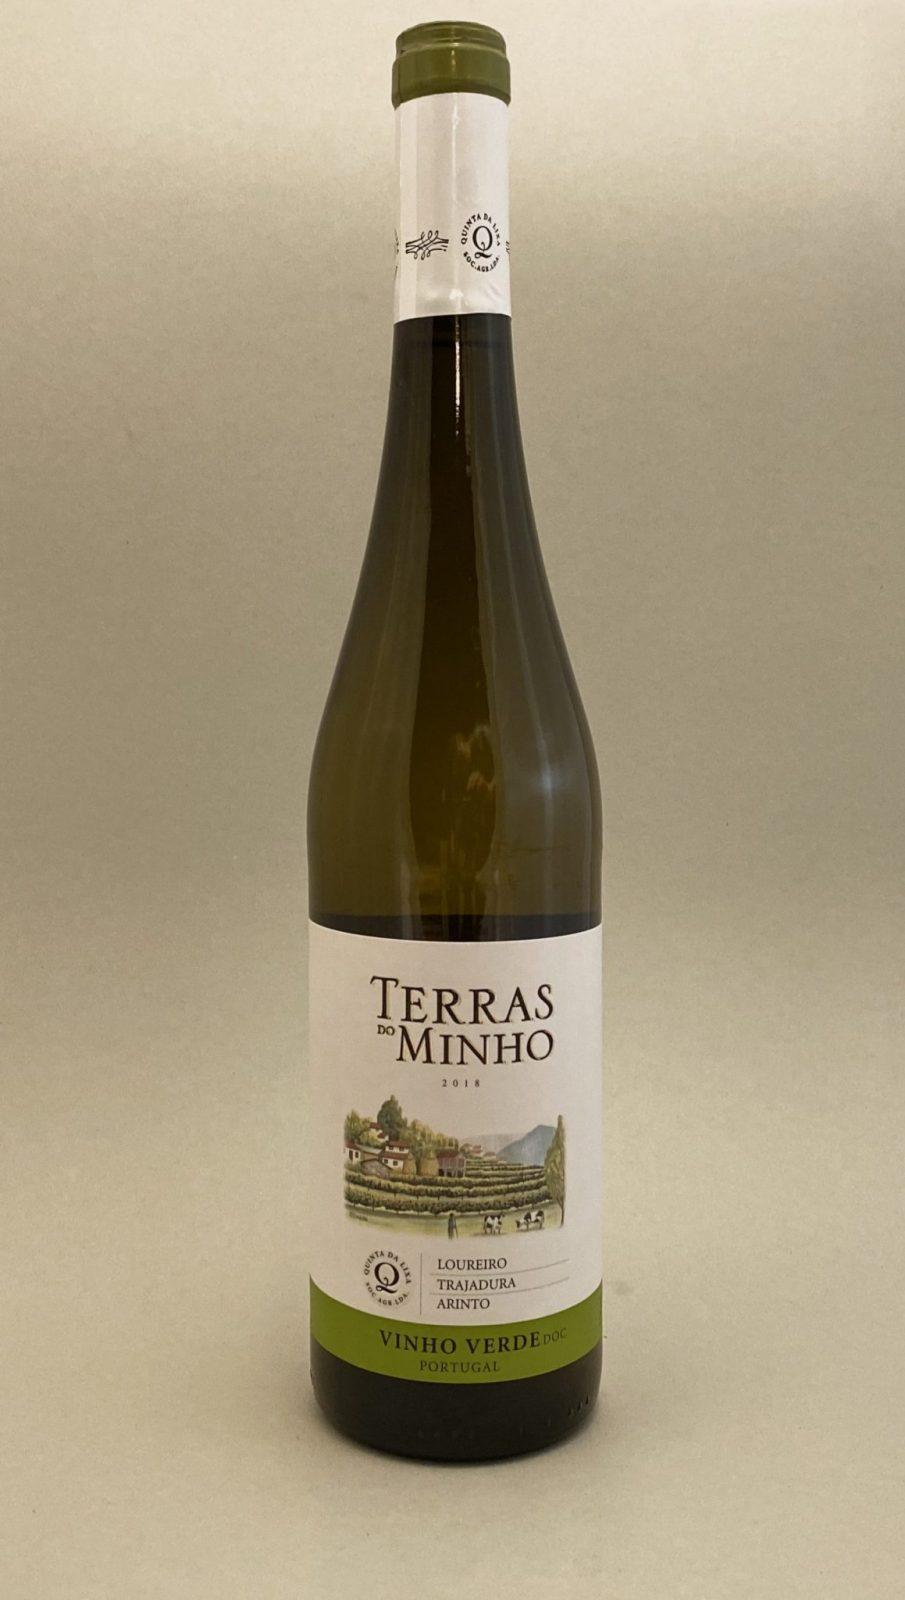 QUINTA DA LIXA Terras Do Minho 2018, vinoteka Sunny wines slnecnice mesto Bratislava, petrzalka, vino biele z Portugalska